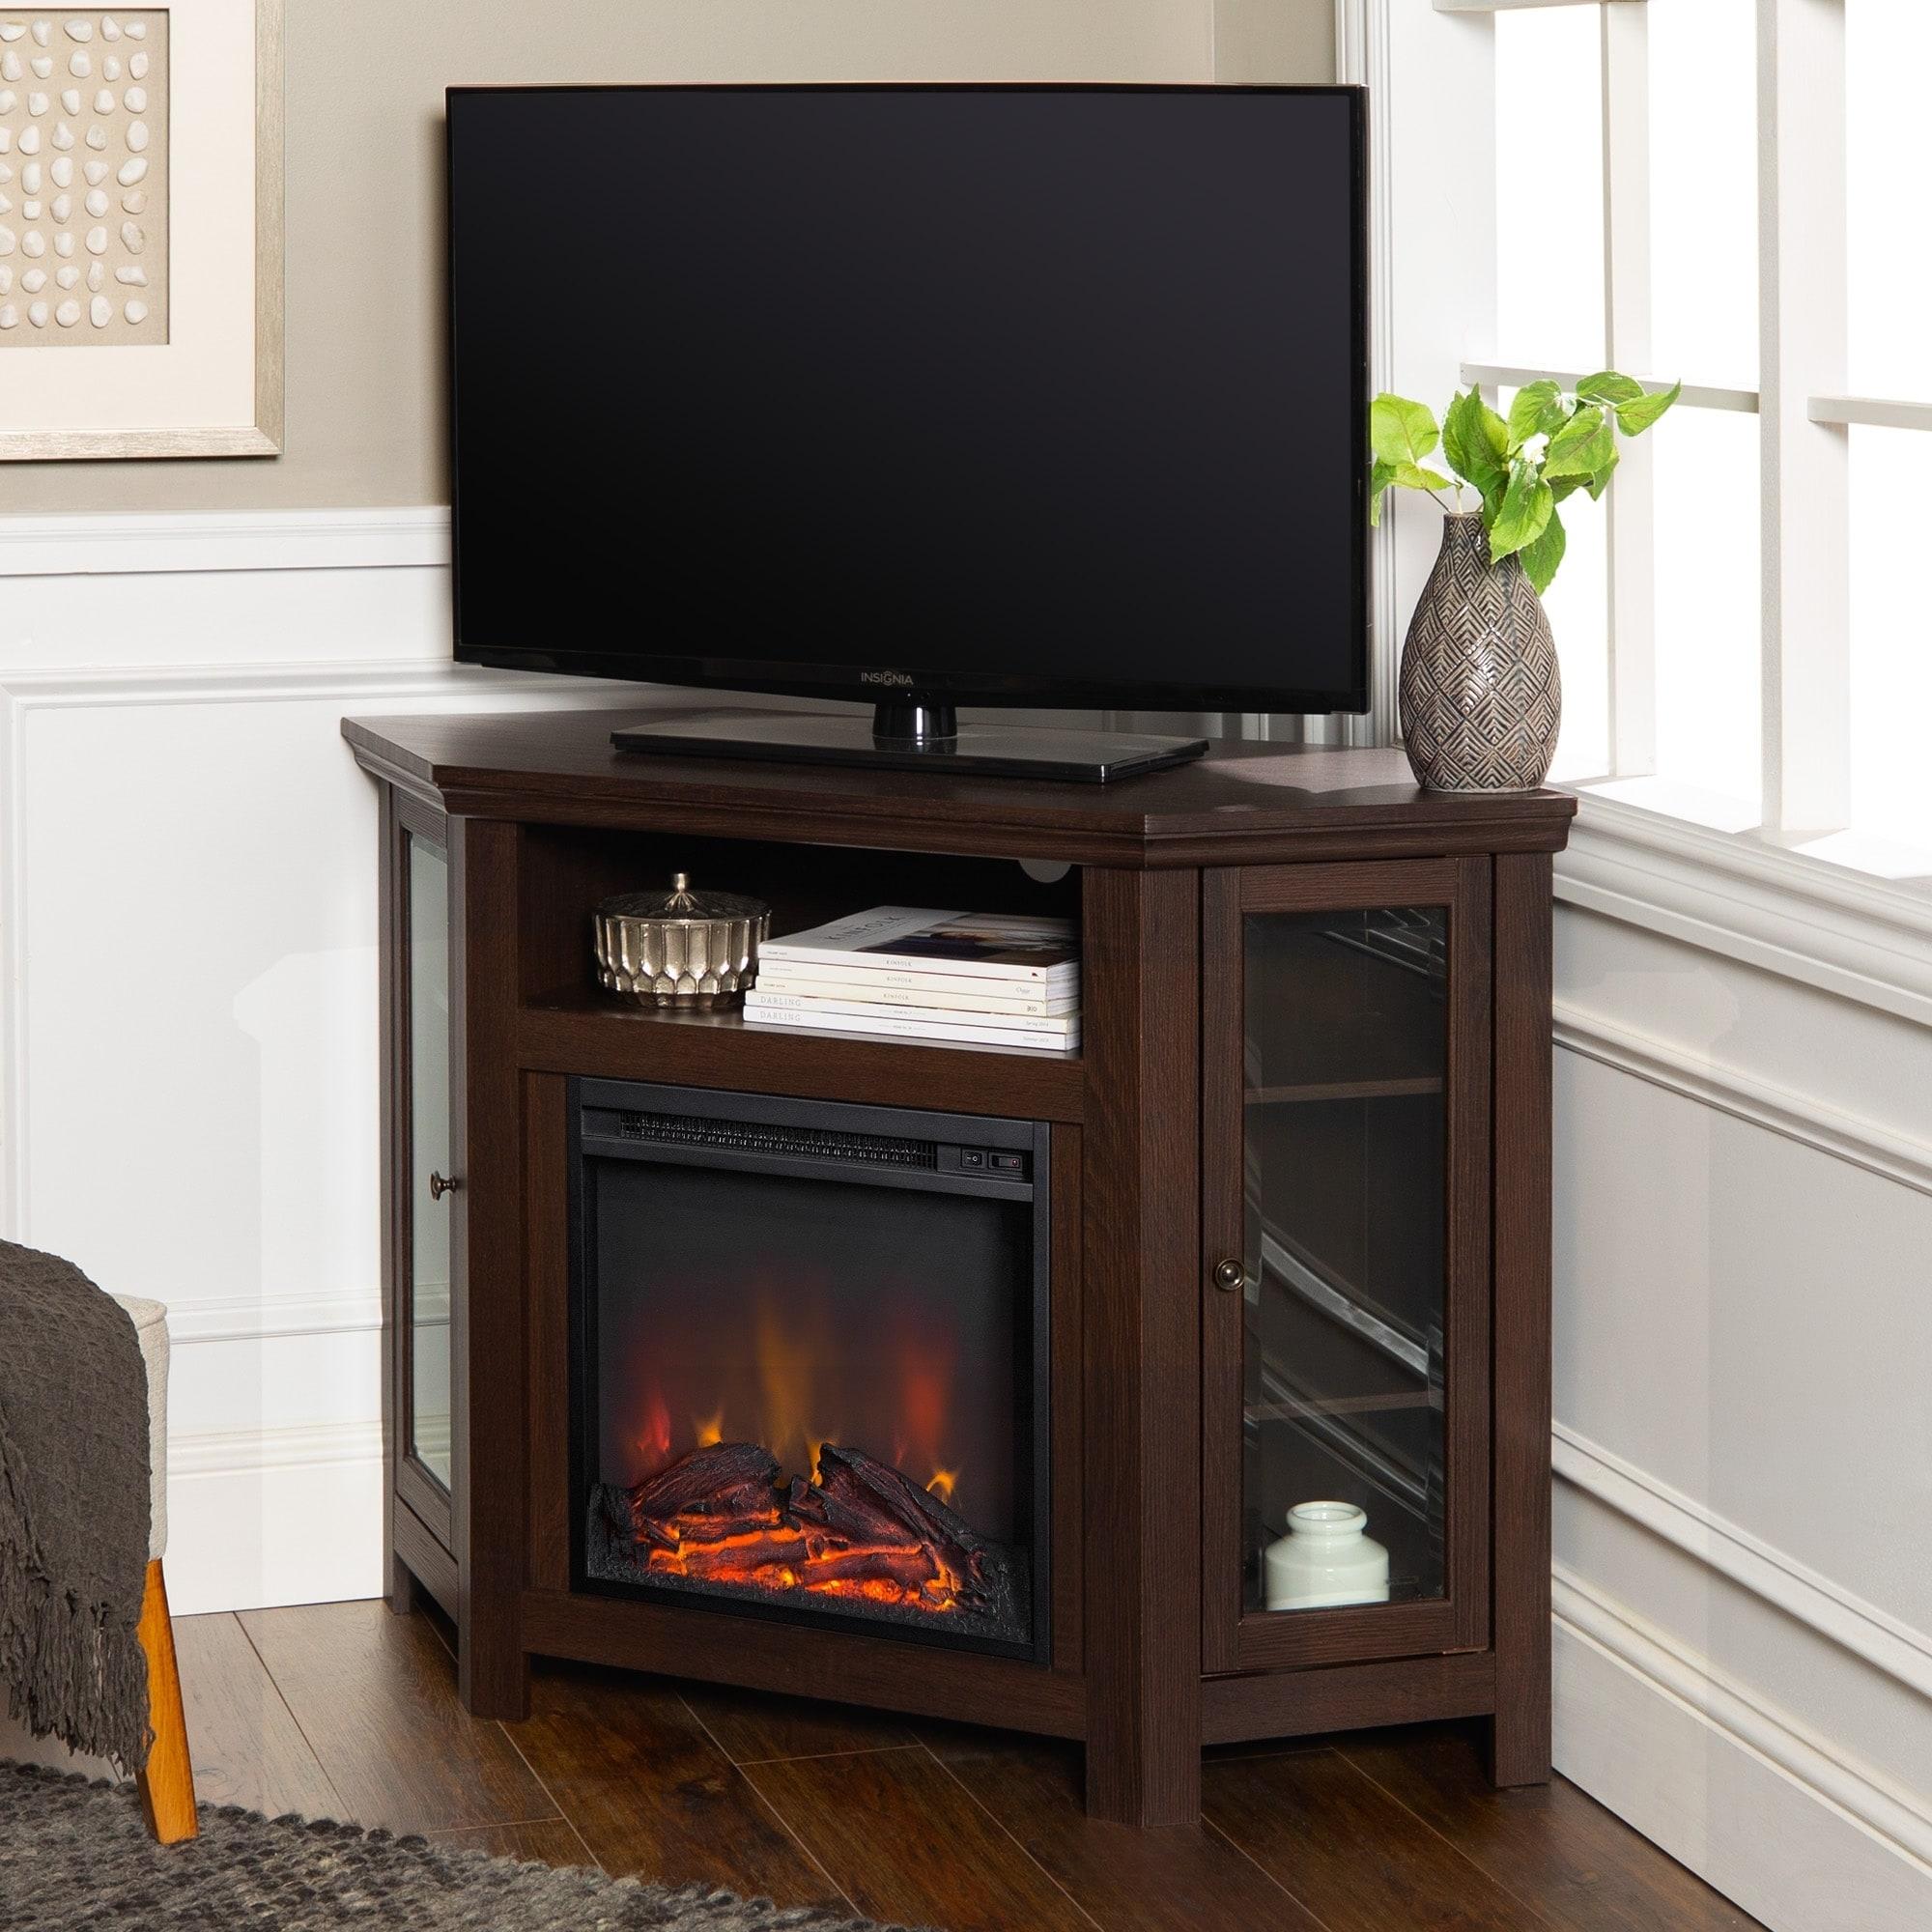 Shop 48 Inch Espresso Corner Fireplace Tv Stand Console On Sale